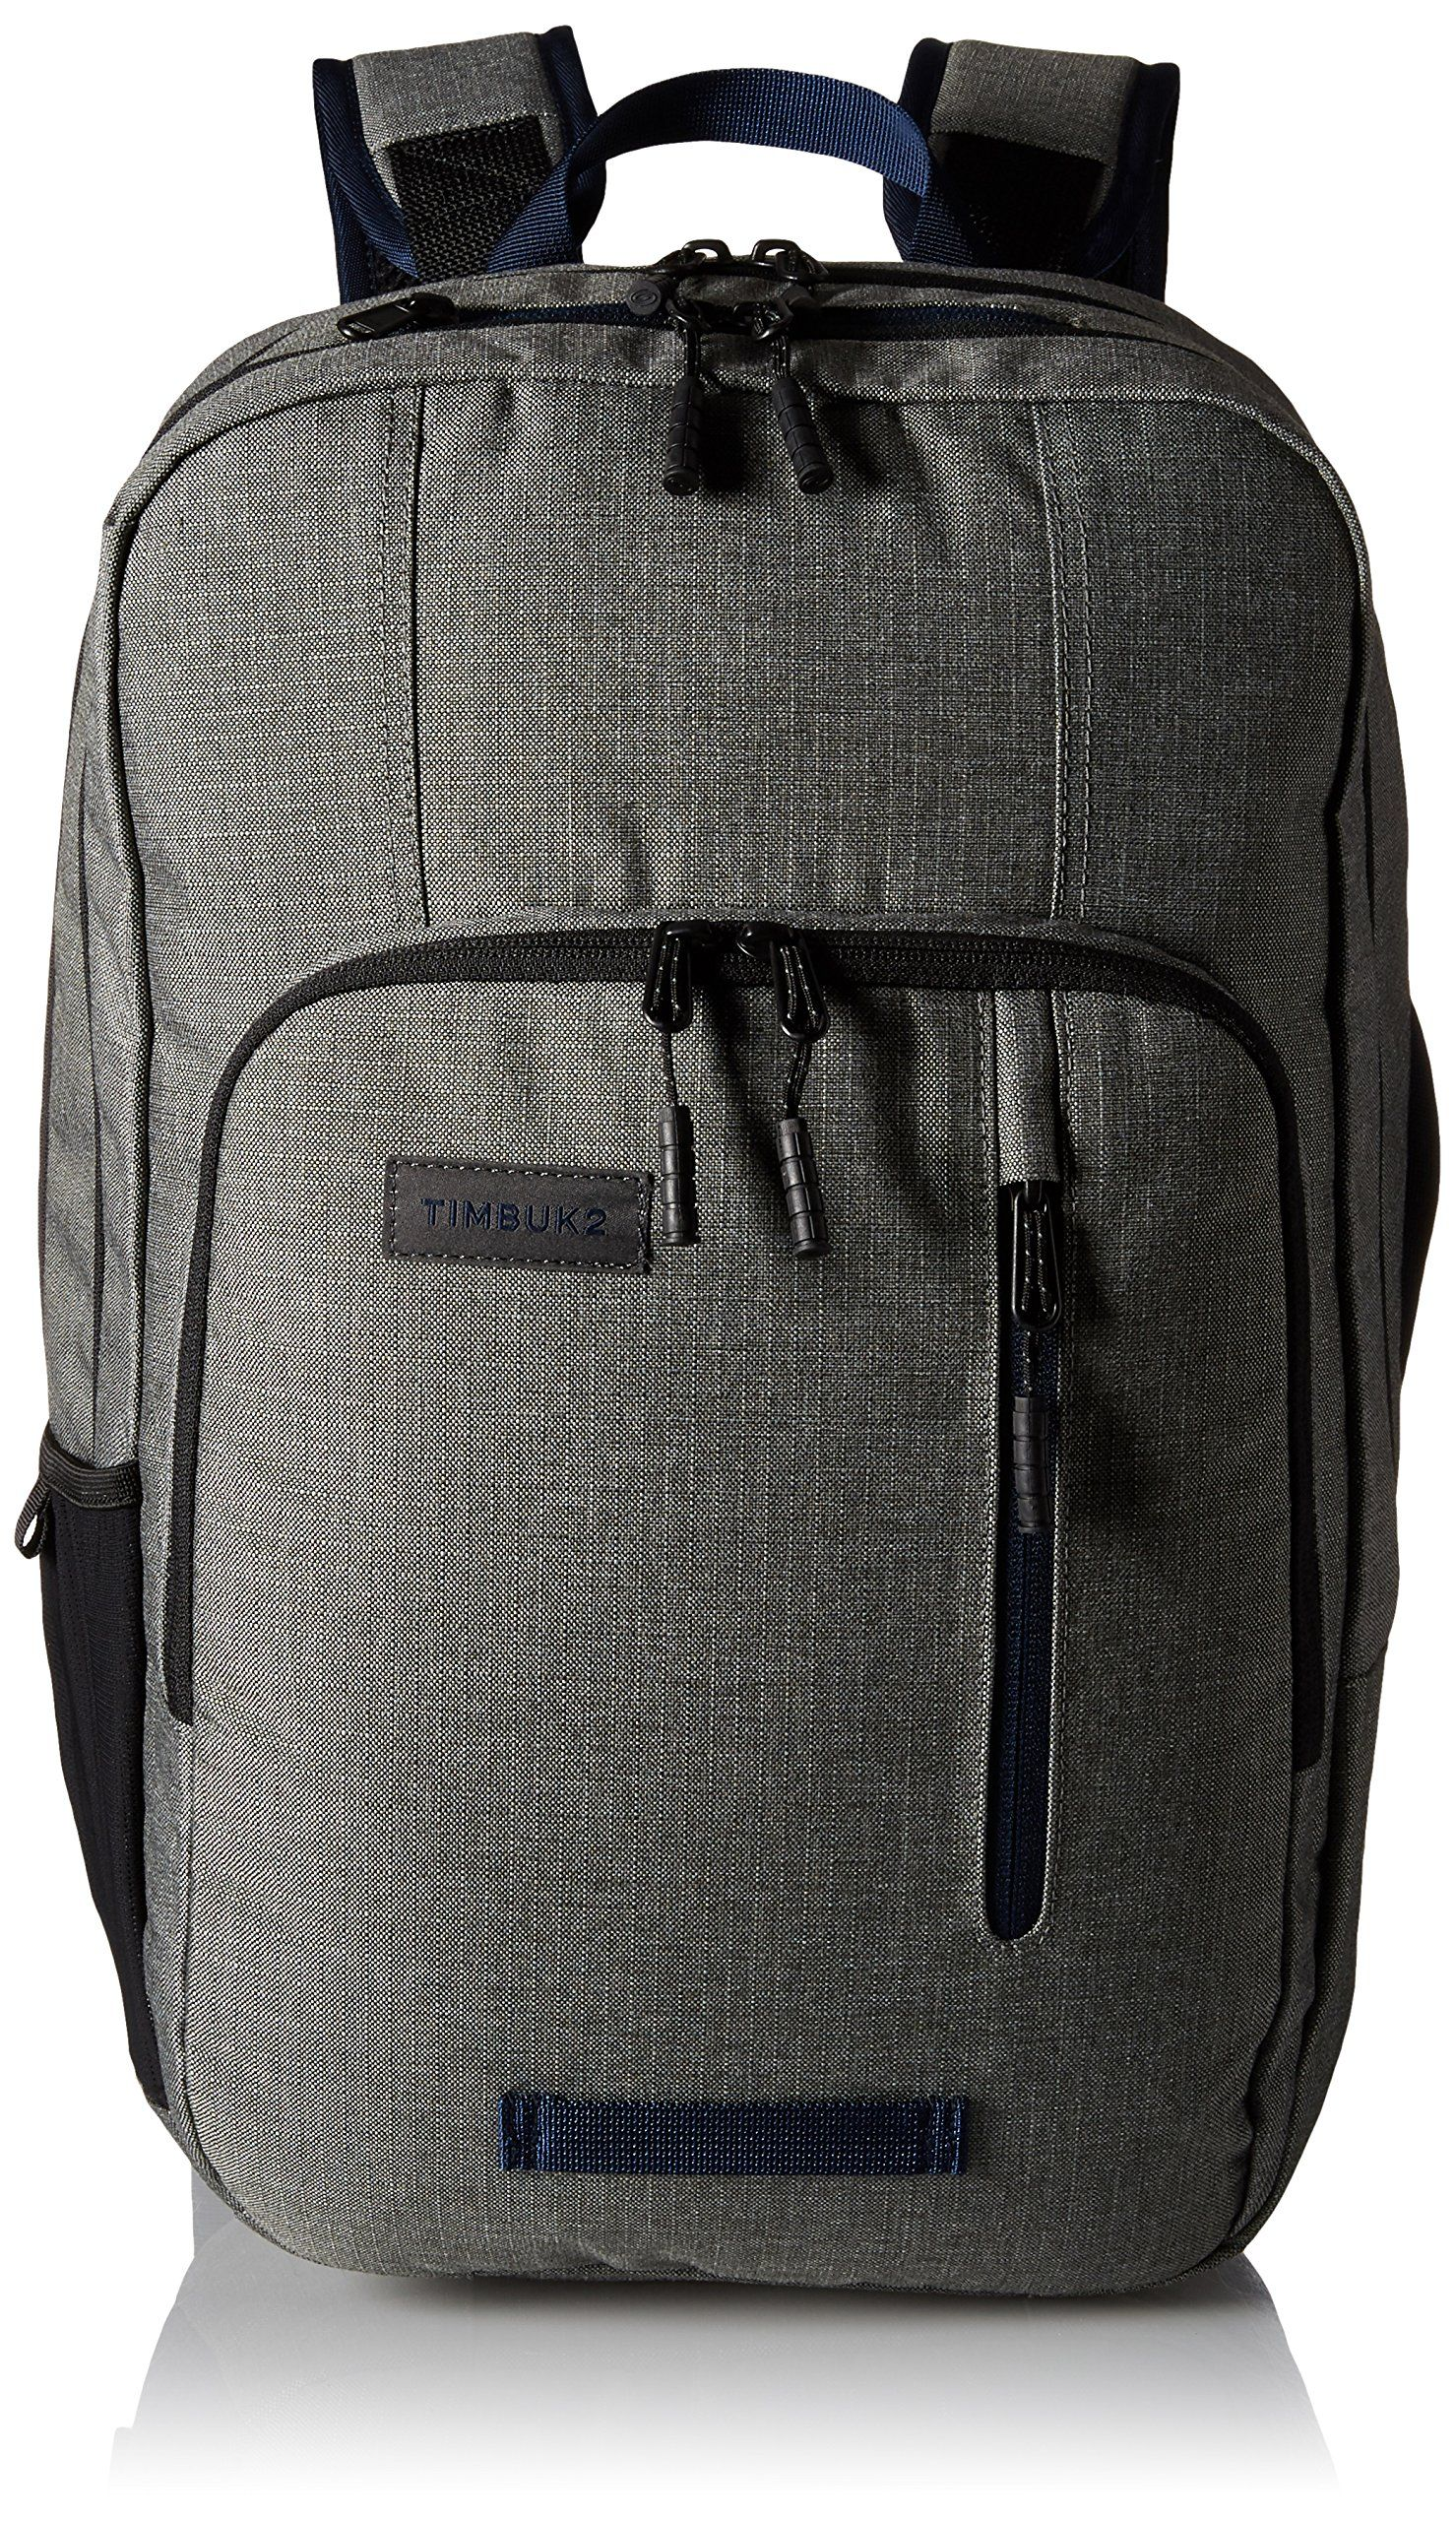 5384384677 Timbuk2 Travel Backpack Review